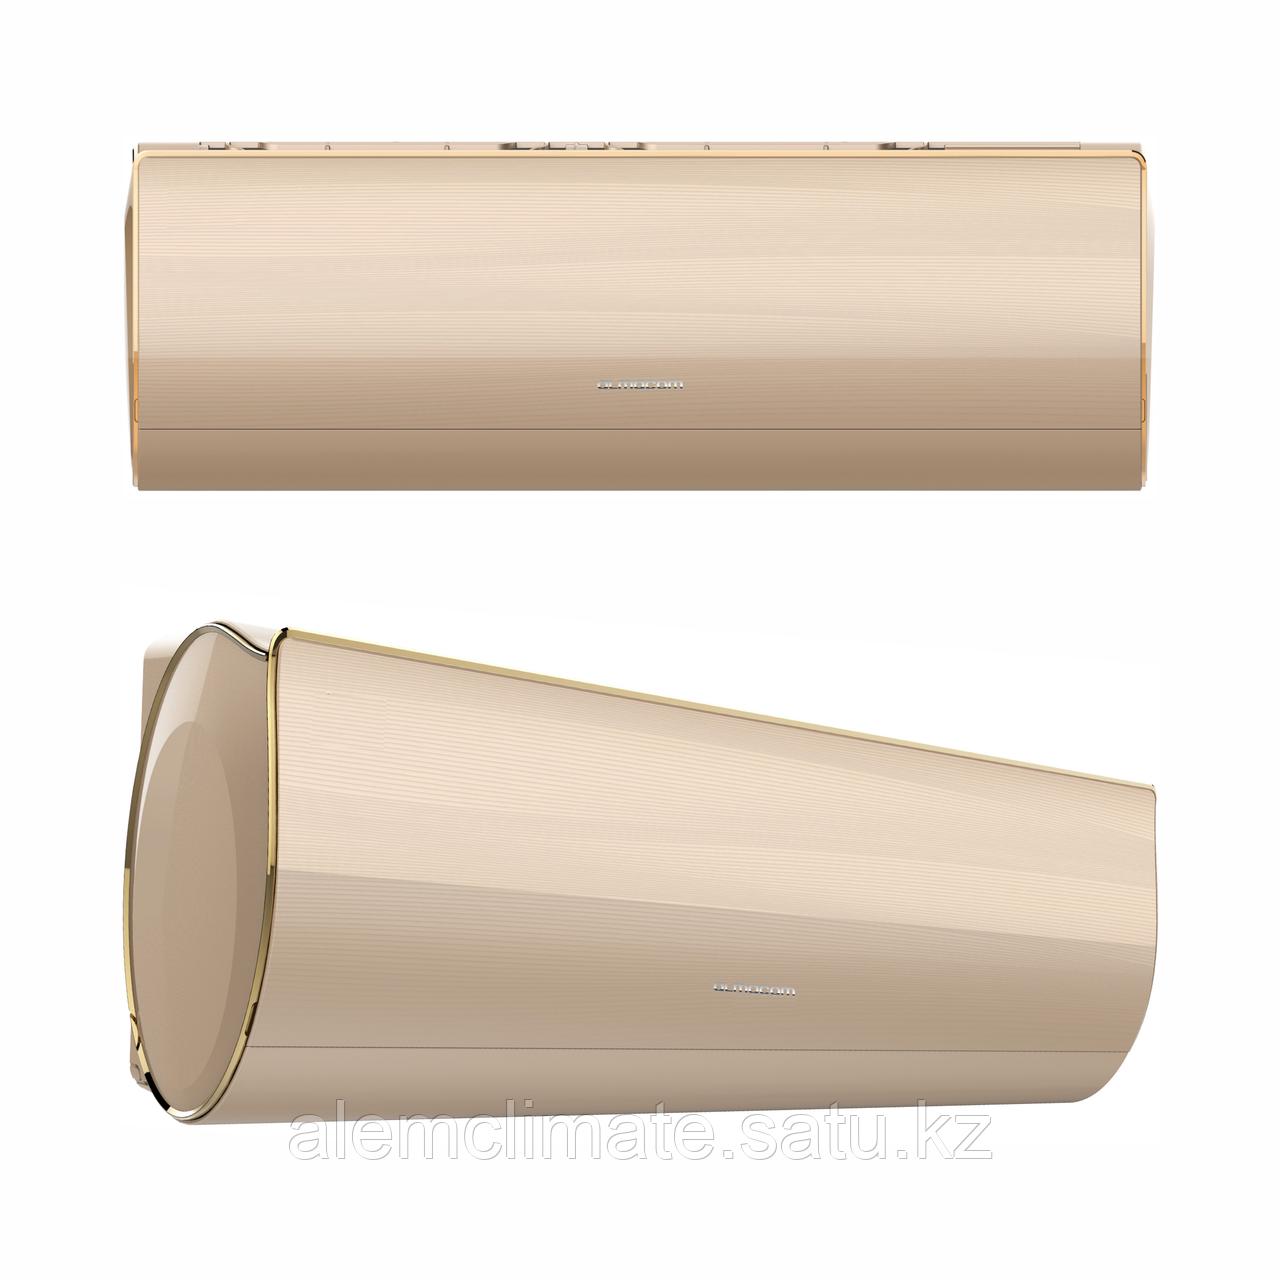 "Настенный кондиционер Almacom Inverter VIP - ACH-13IV ""медная инсталляция"" (30-35м2.)"